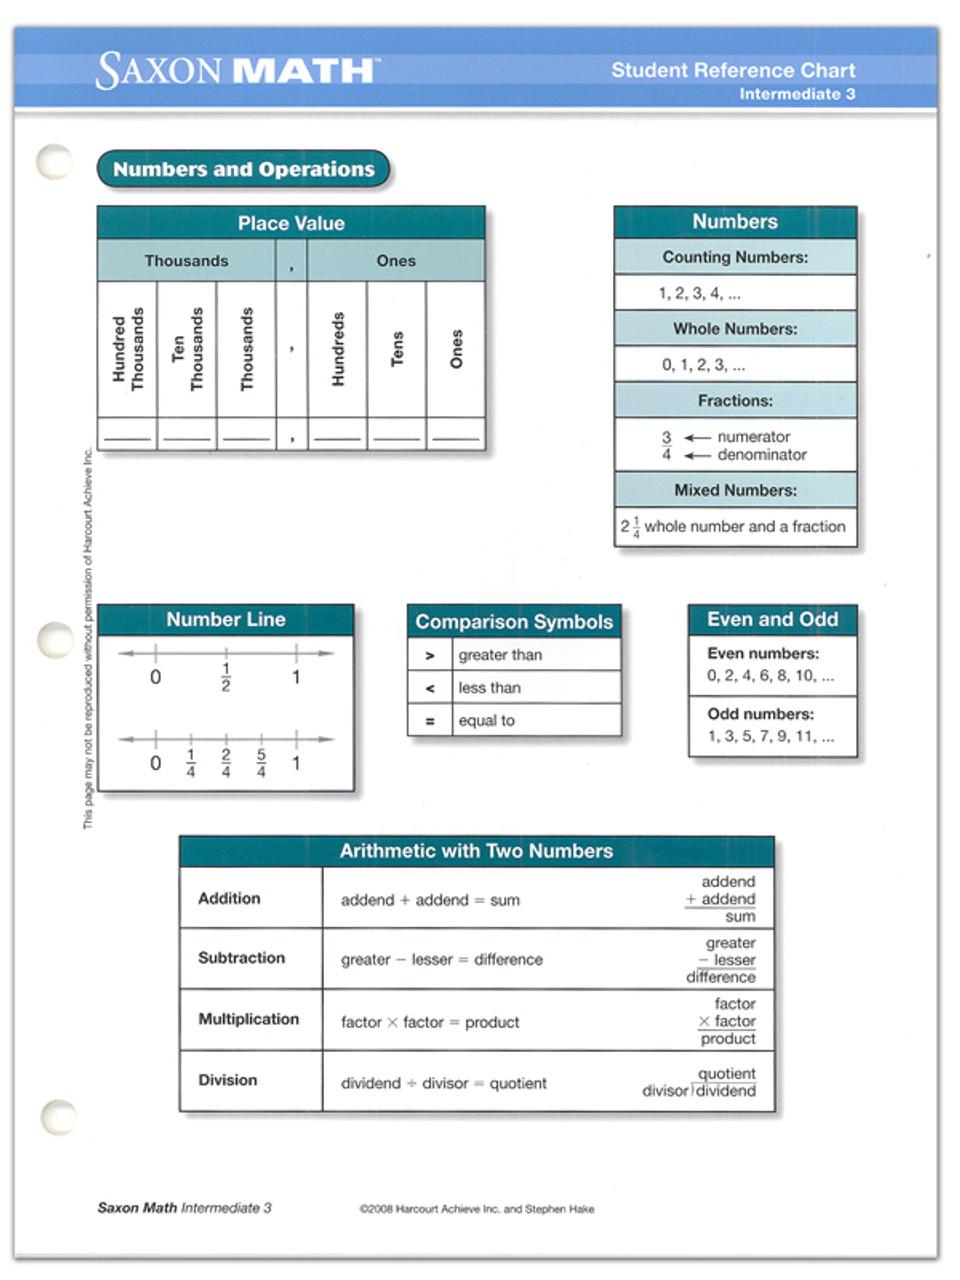 medium resolution of Saxon Math Grade 3 Intermediate Student Reference Chart - Classroom  Resource Center